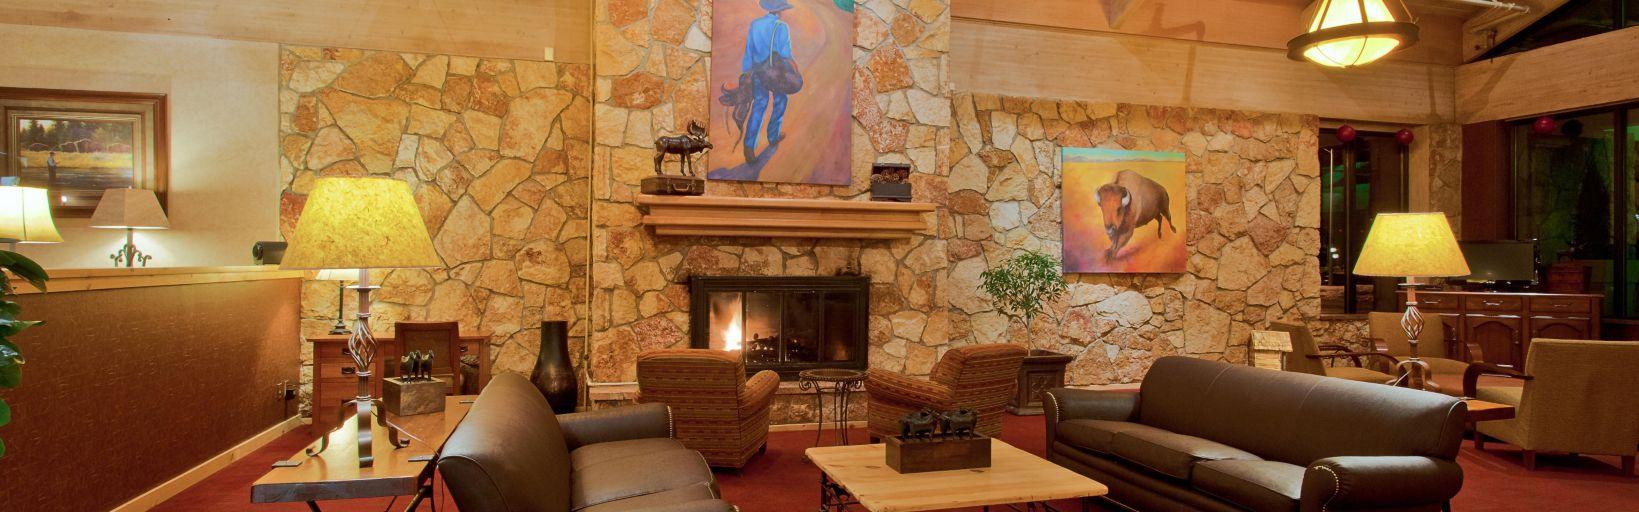 Inside the Bozeman Holiday Inn